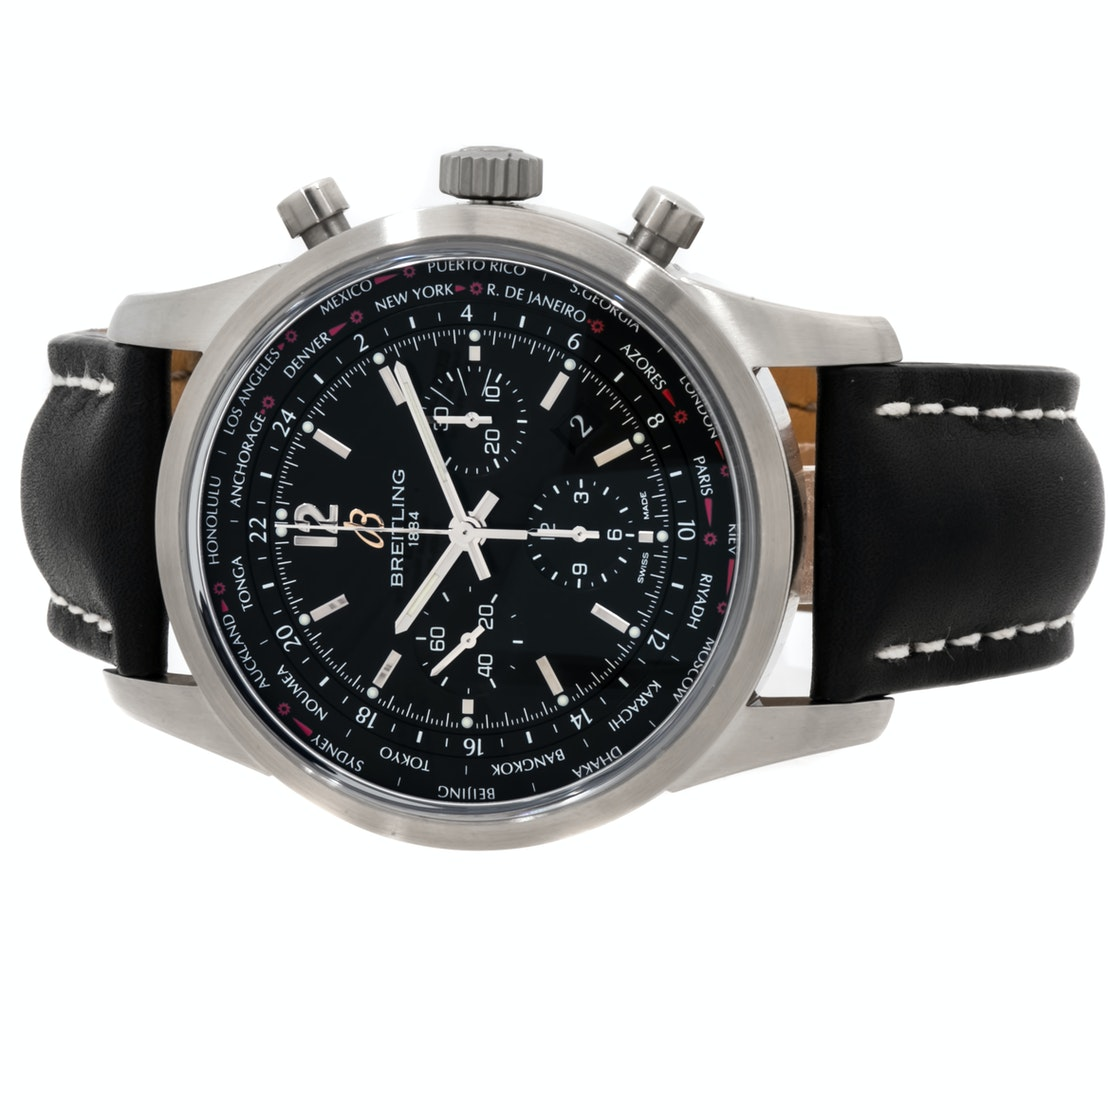 Breitling Transocean Unitime Chronograph Pilot AB0510U6/BC26